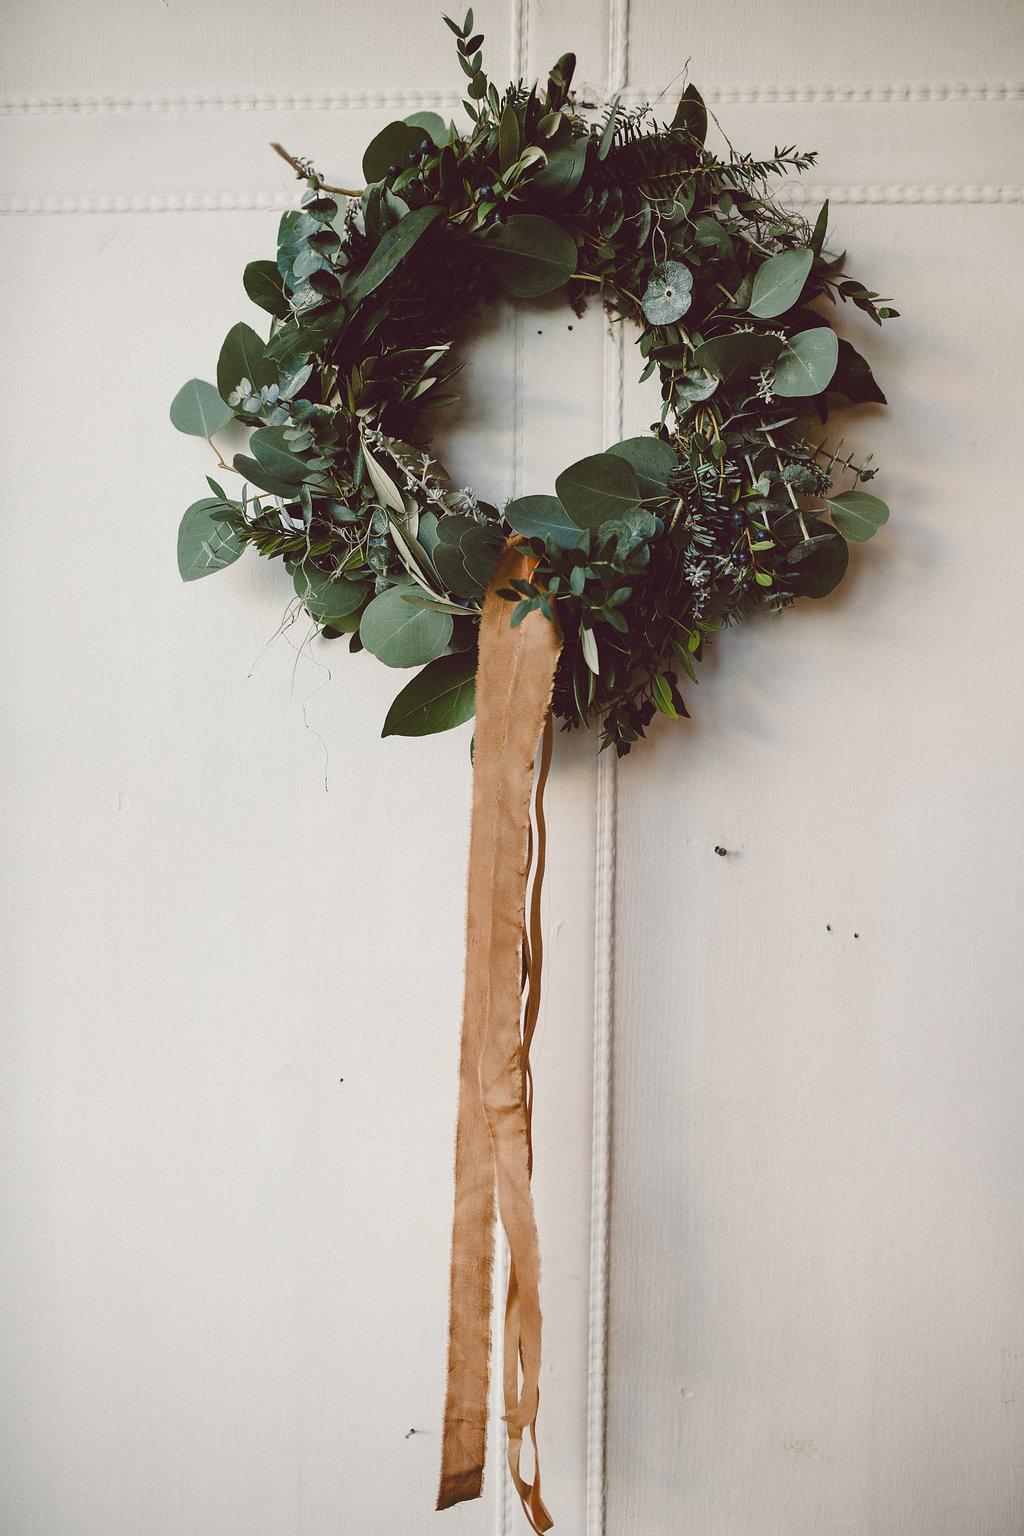 flower-workshop-wreath-making-the-good-florist-16.jpg